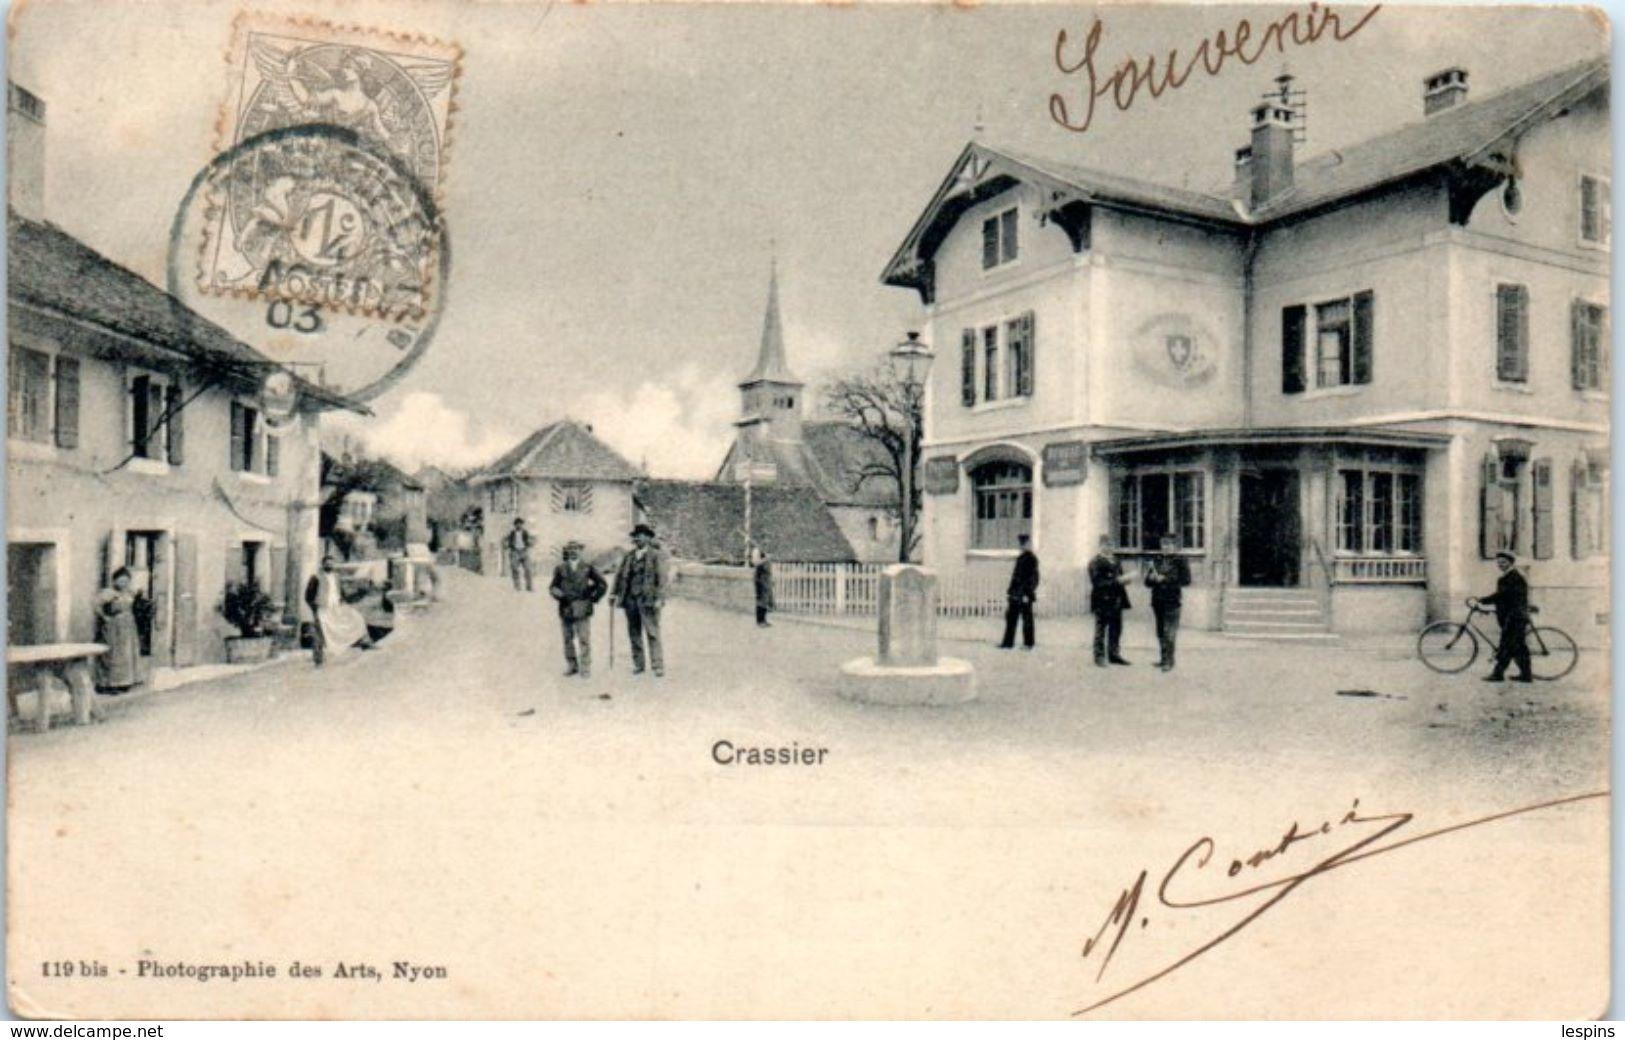 26 - CRASSIER - France